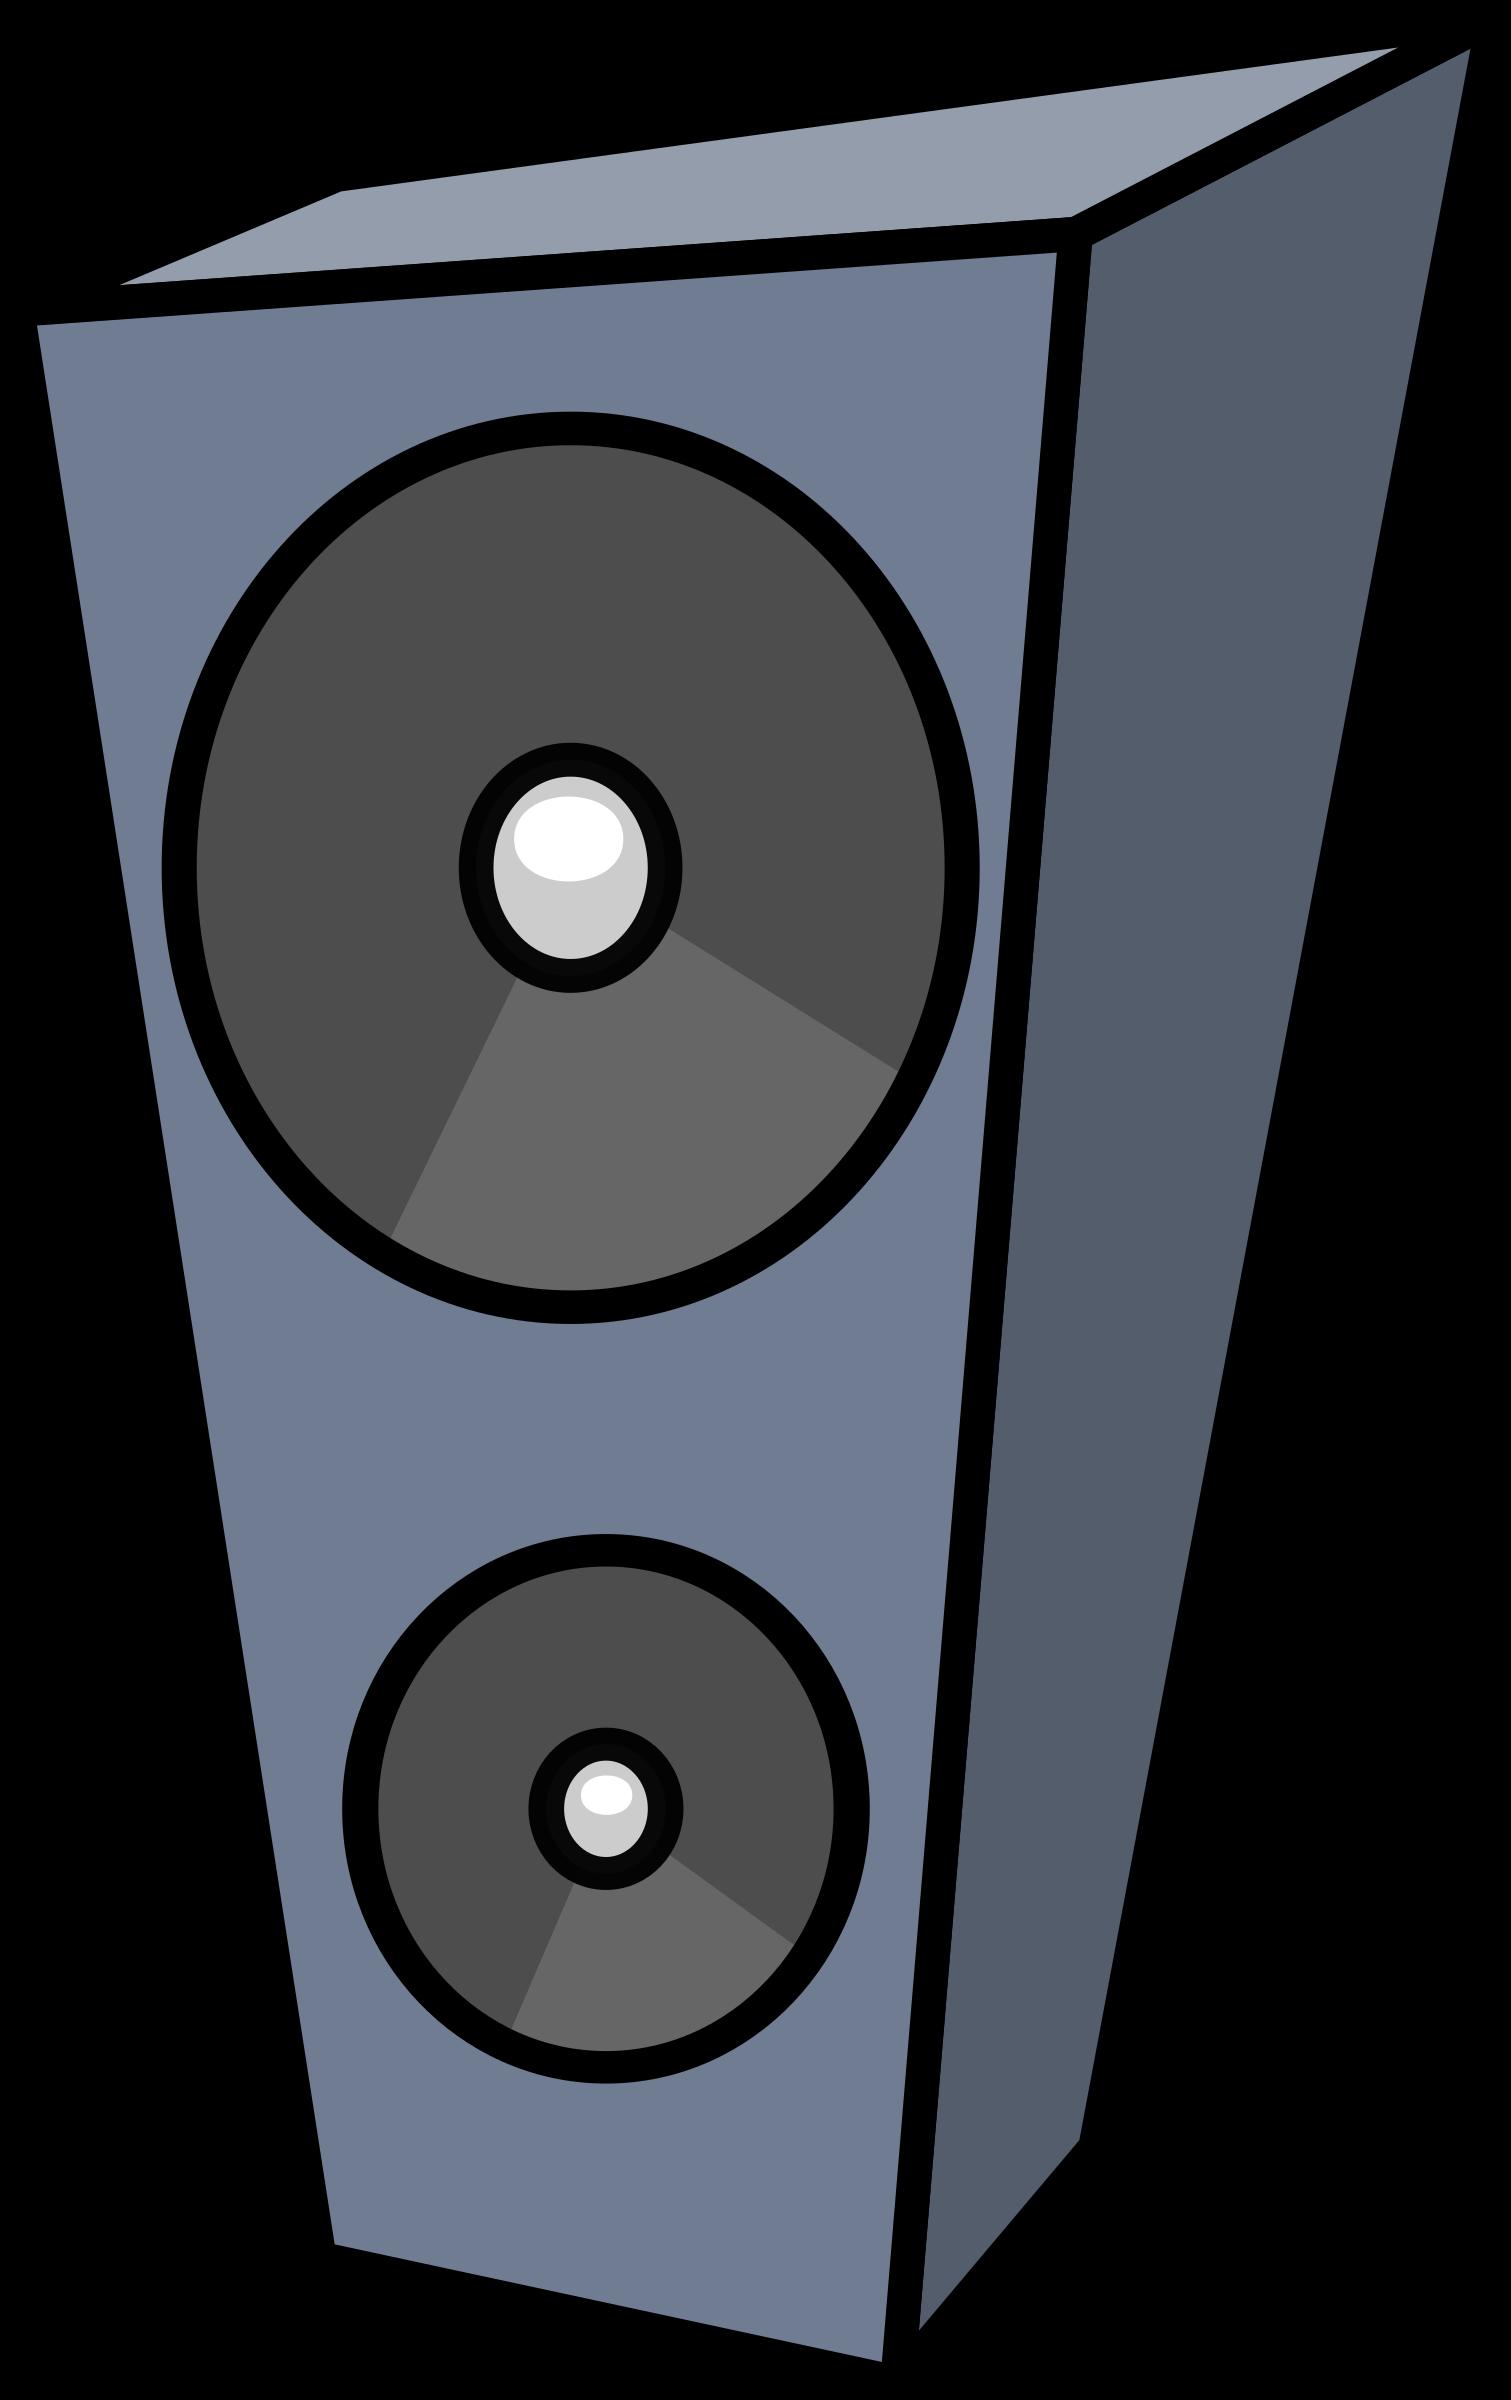 Clipart music abstract. Cartoon speaker big image